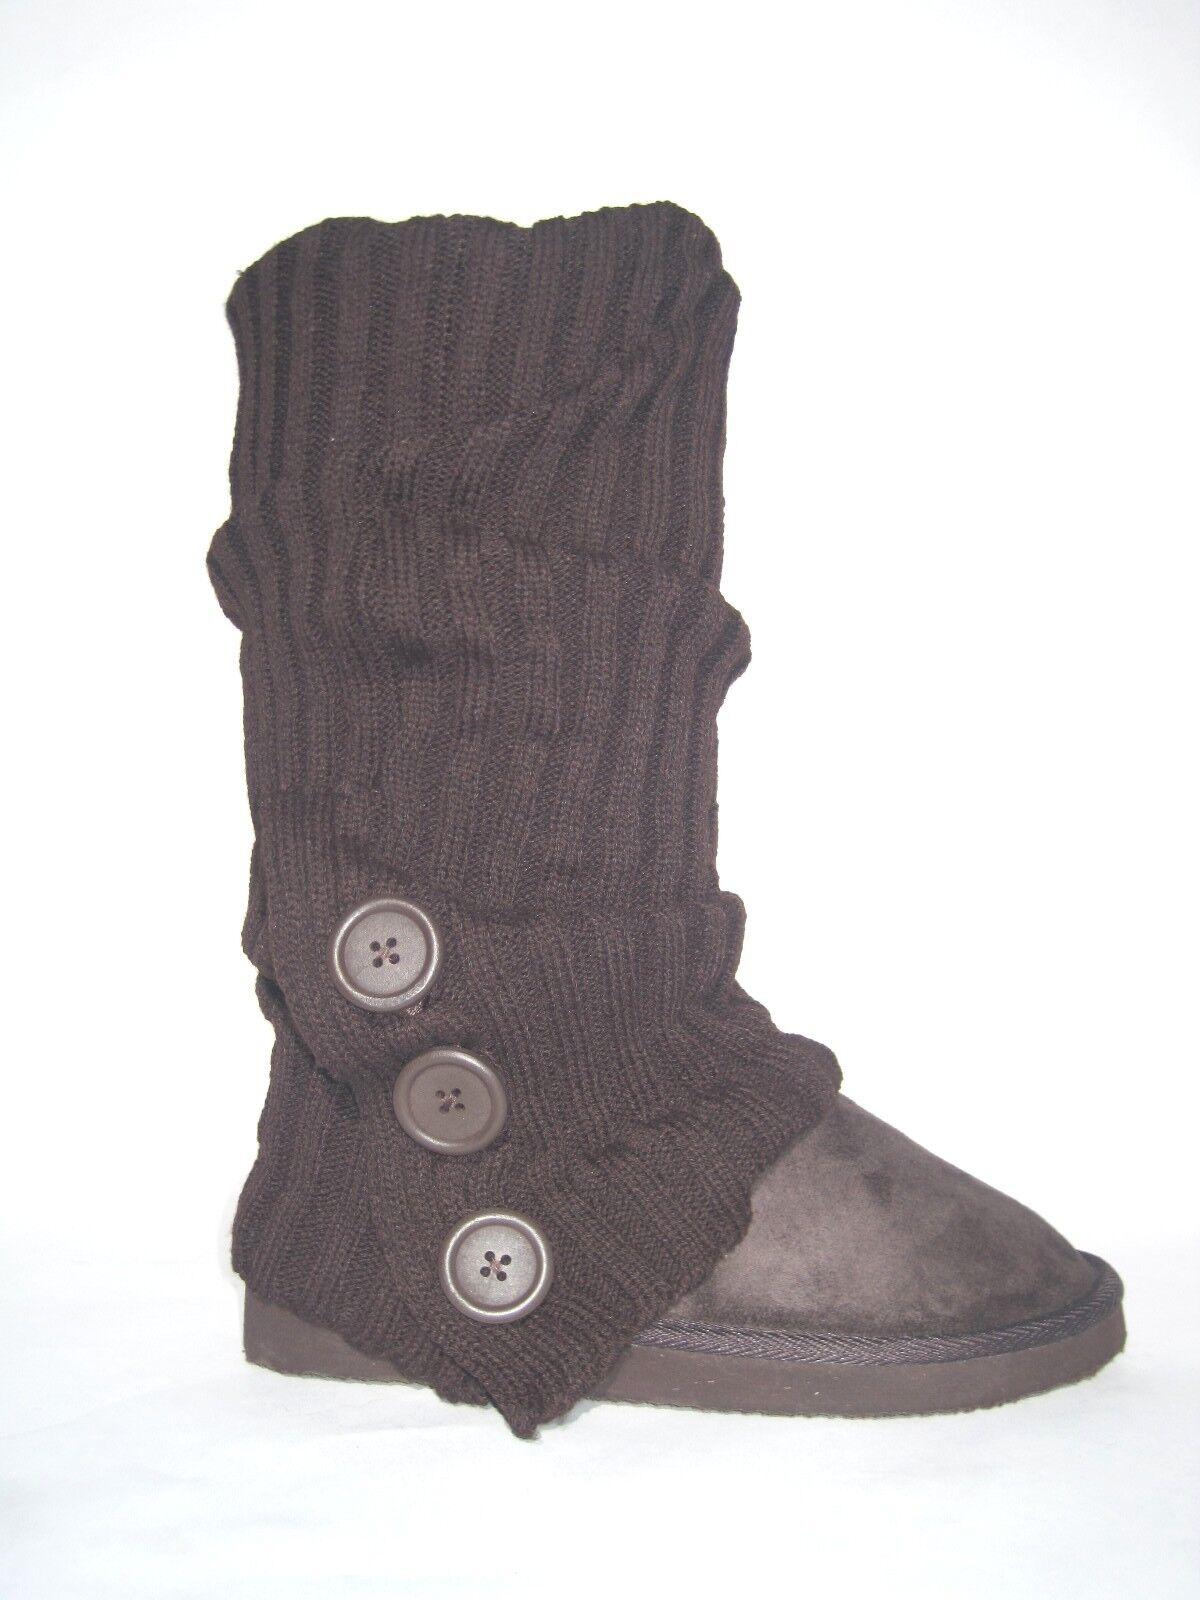 Dansko Madigan Black Leather Wedge Mules Size 40 Women's Shoes Wears Like A Size 39